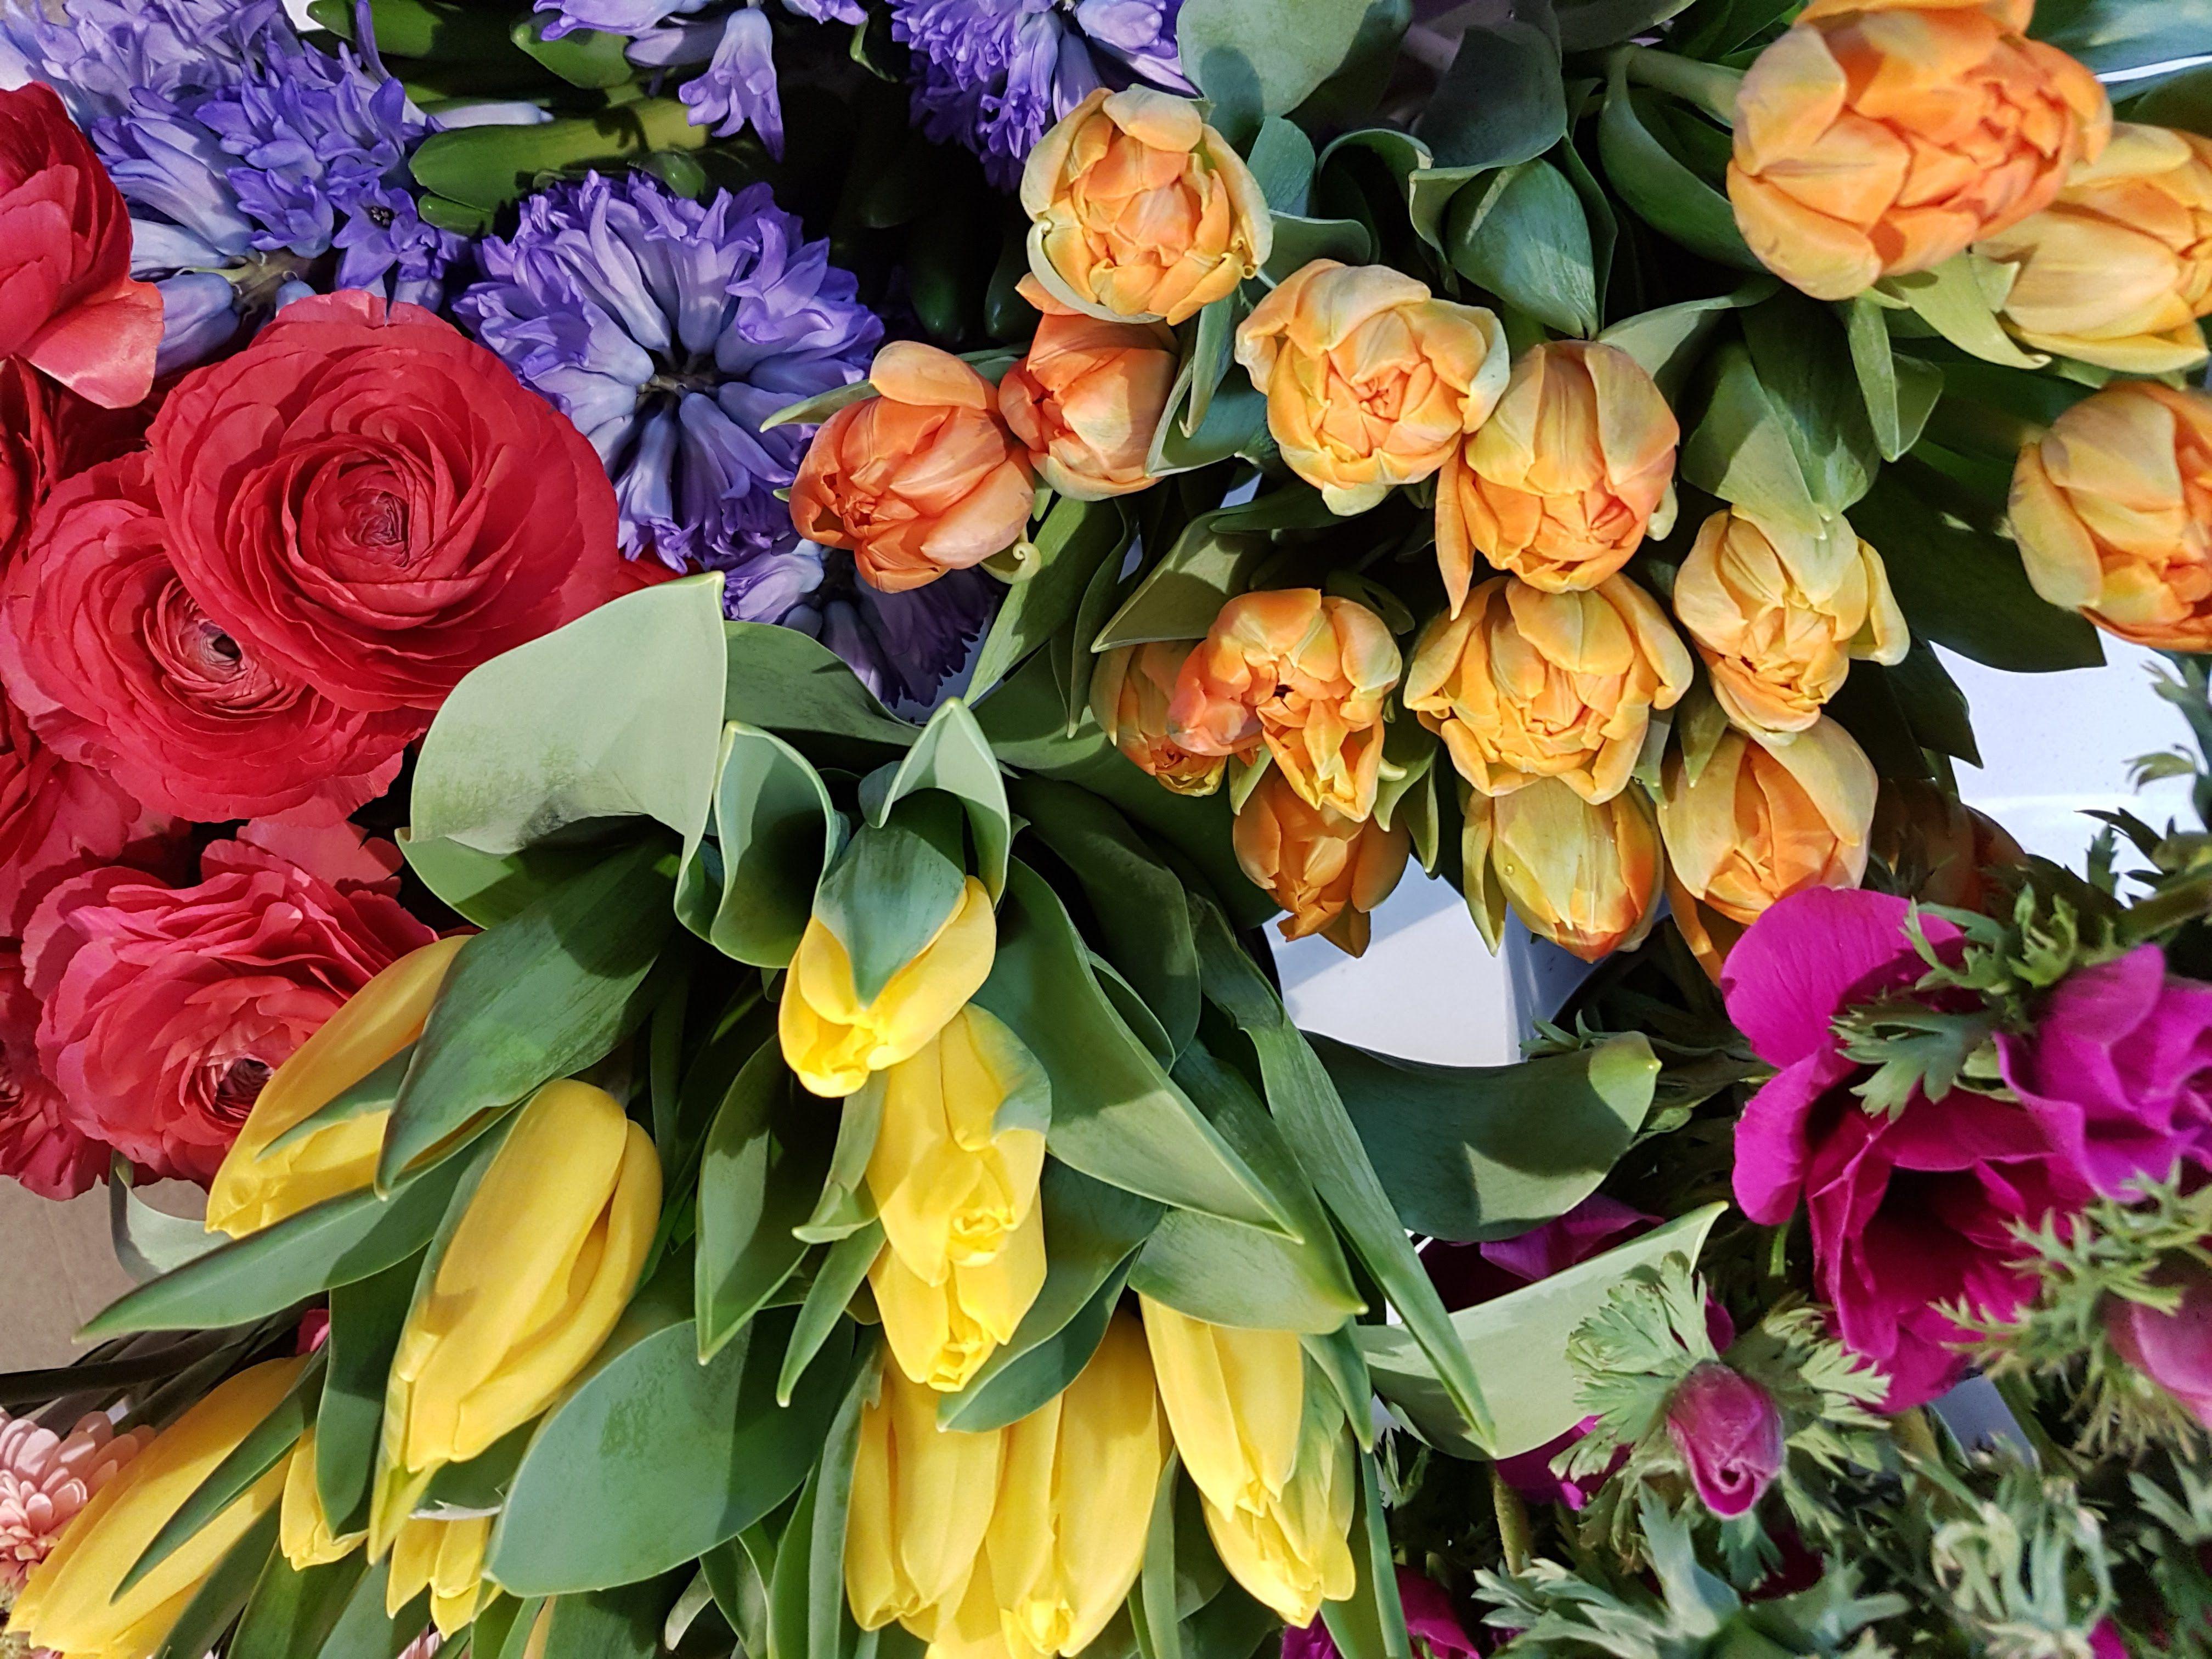 Beet Und Balkonpflanzen Munster Fruhlingsblumen Gartnerei Wagner